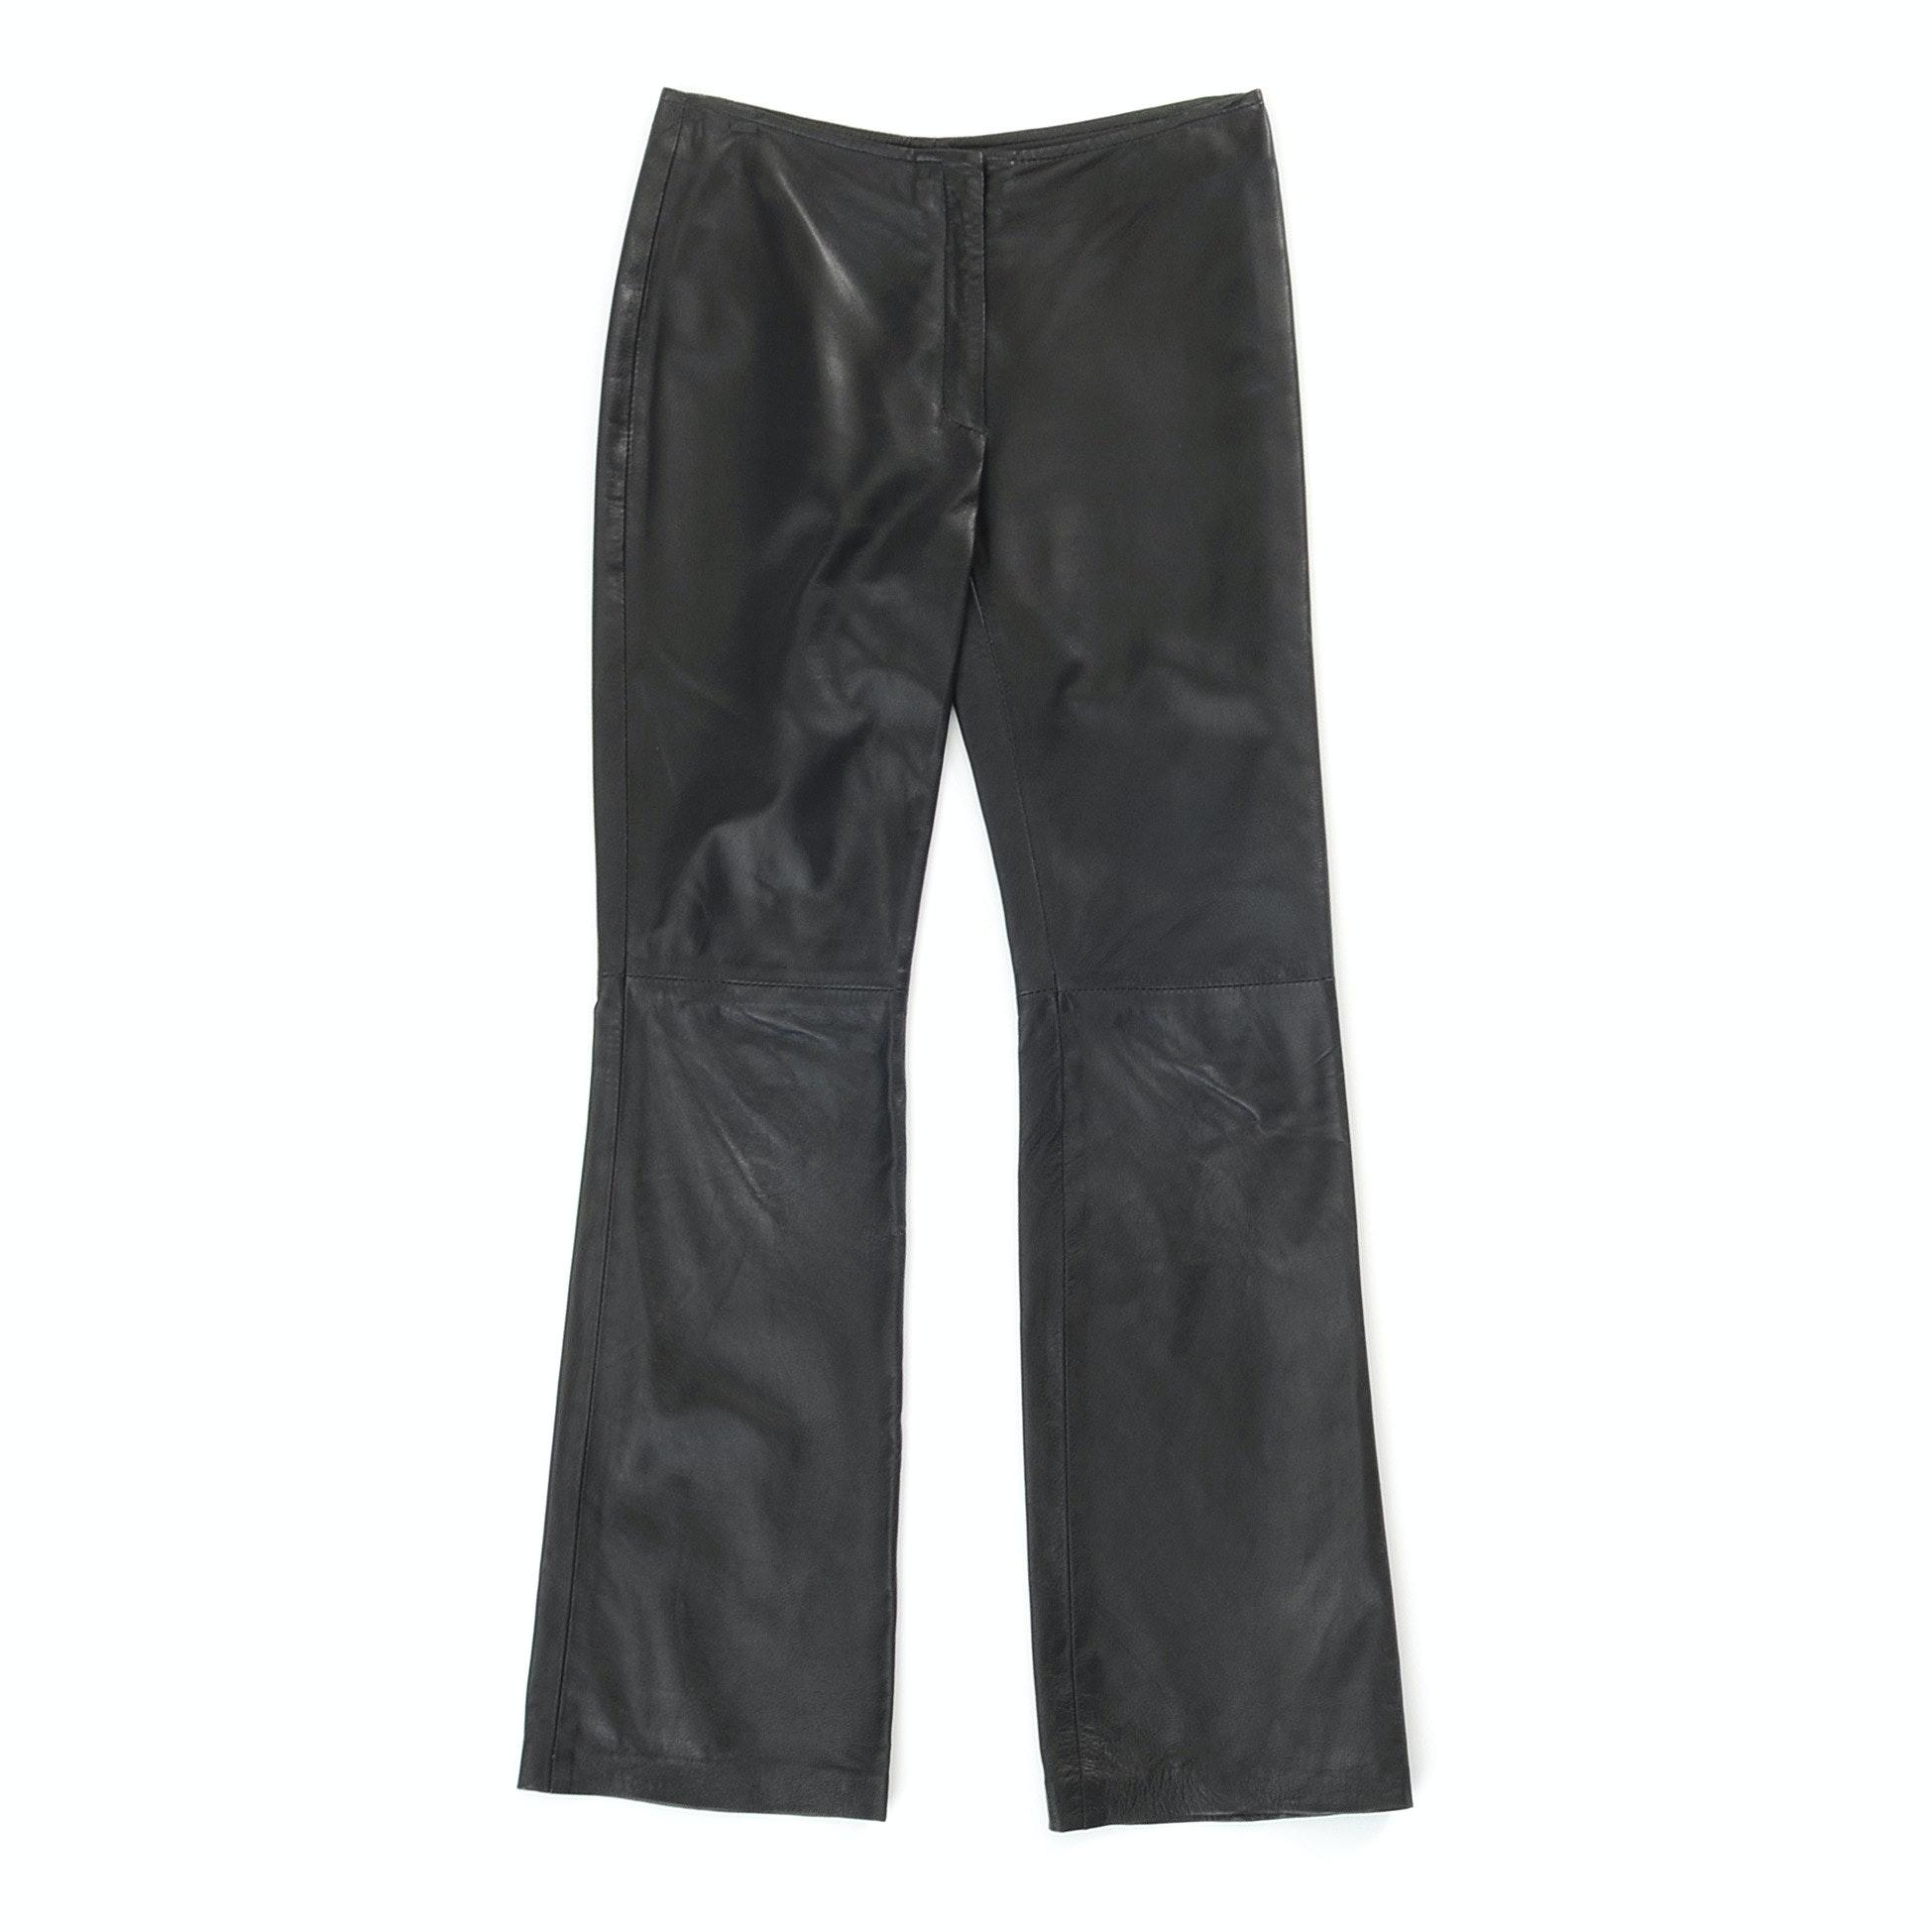 Jill Stuart Black Lambskin Leather Pants